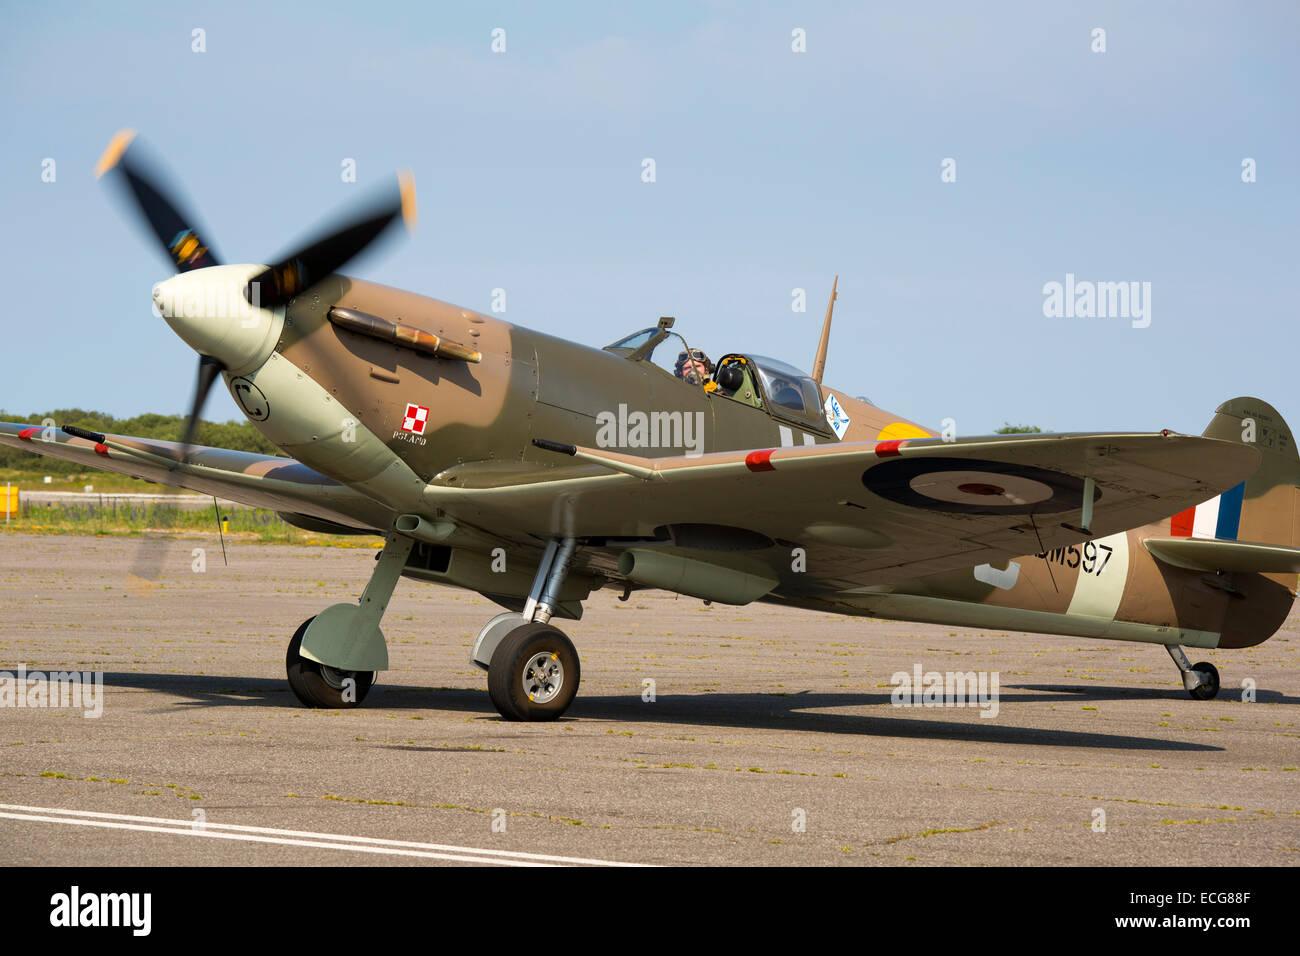 Vickers Supermarine Spitfire Mk Vb J-HC BM597 G-MKVB taxiing after landing at Lydd Airport - Stock Image